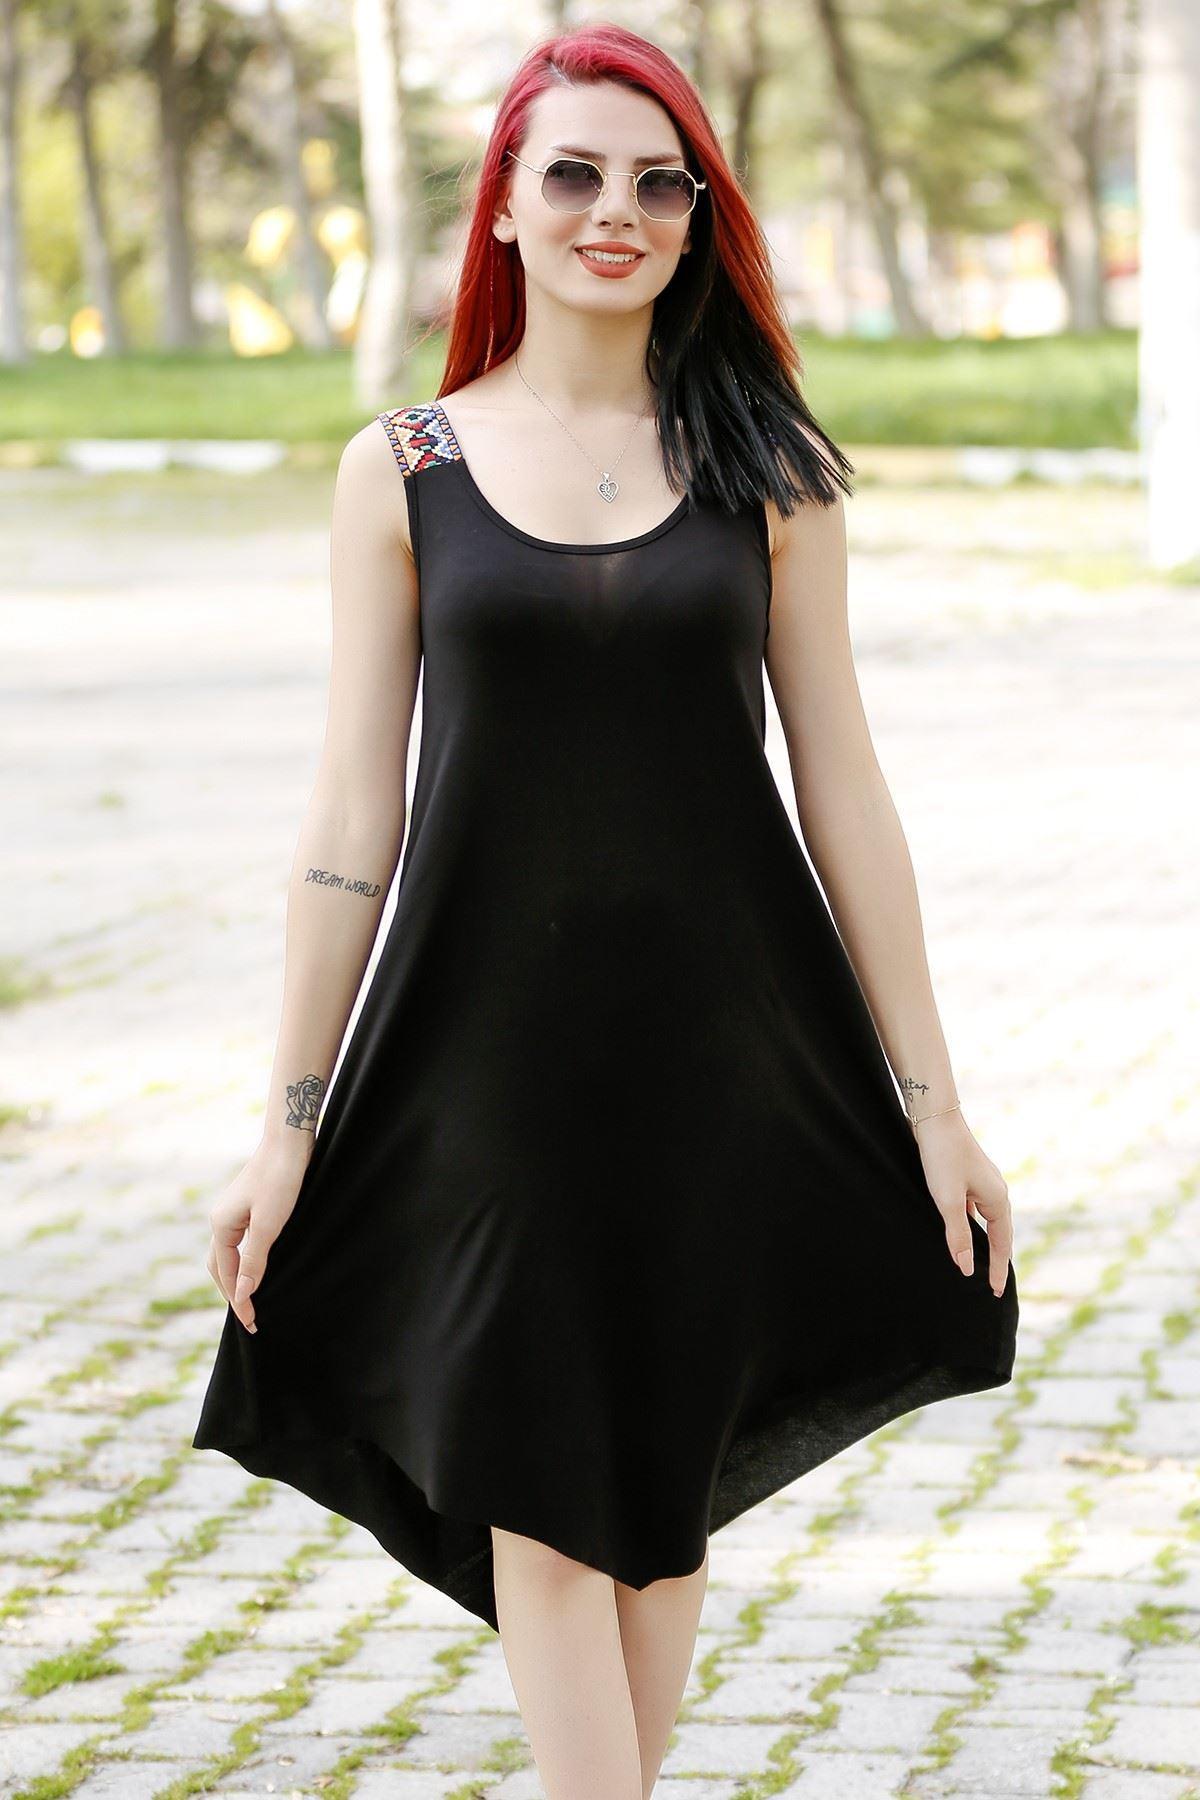 Omuzu Aksesuarlı Elbise Siyah - 1221.1095.